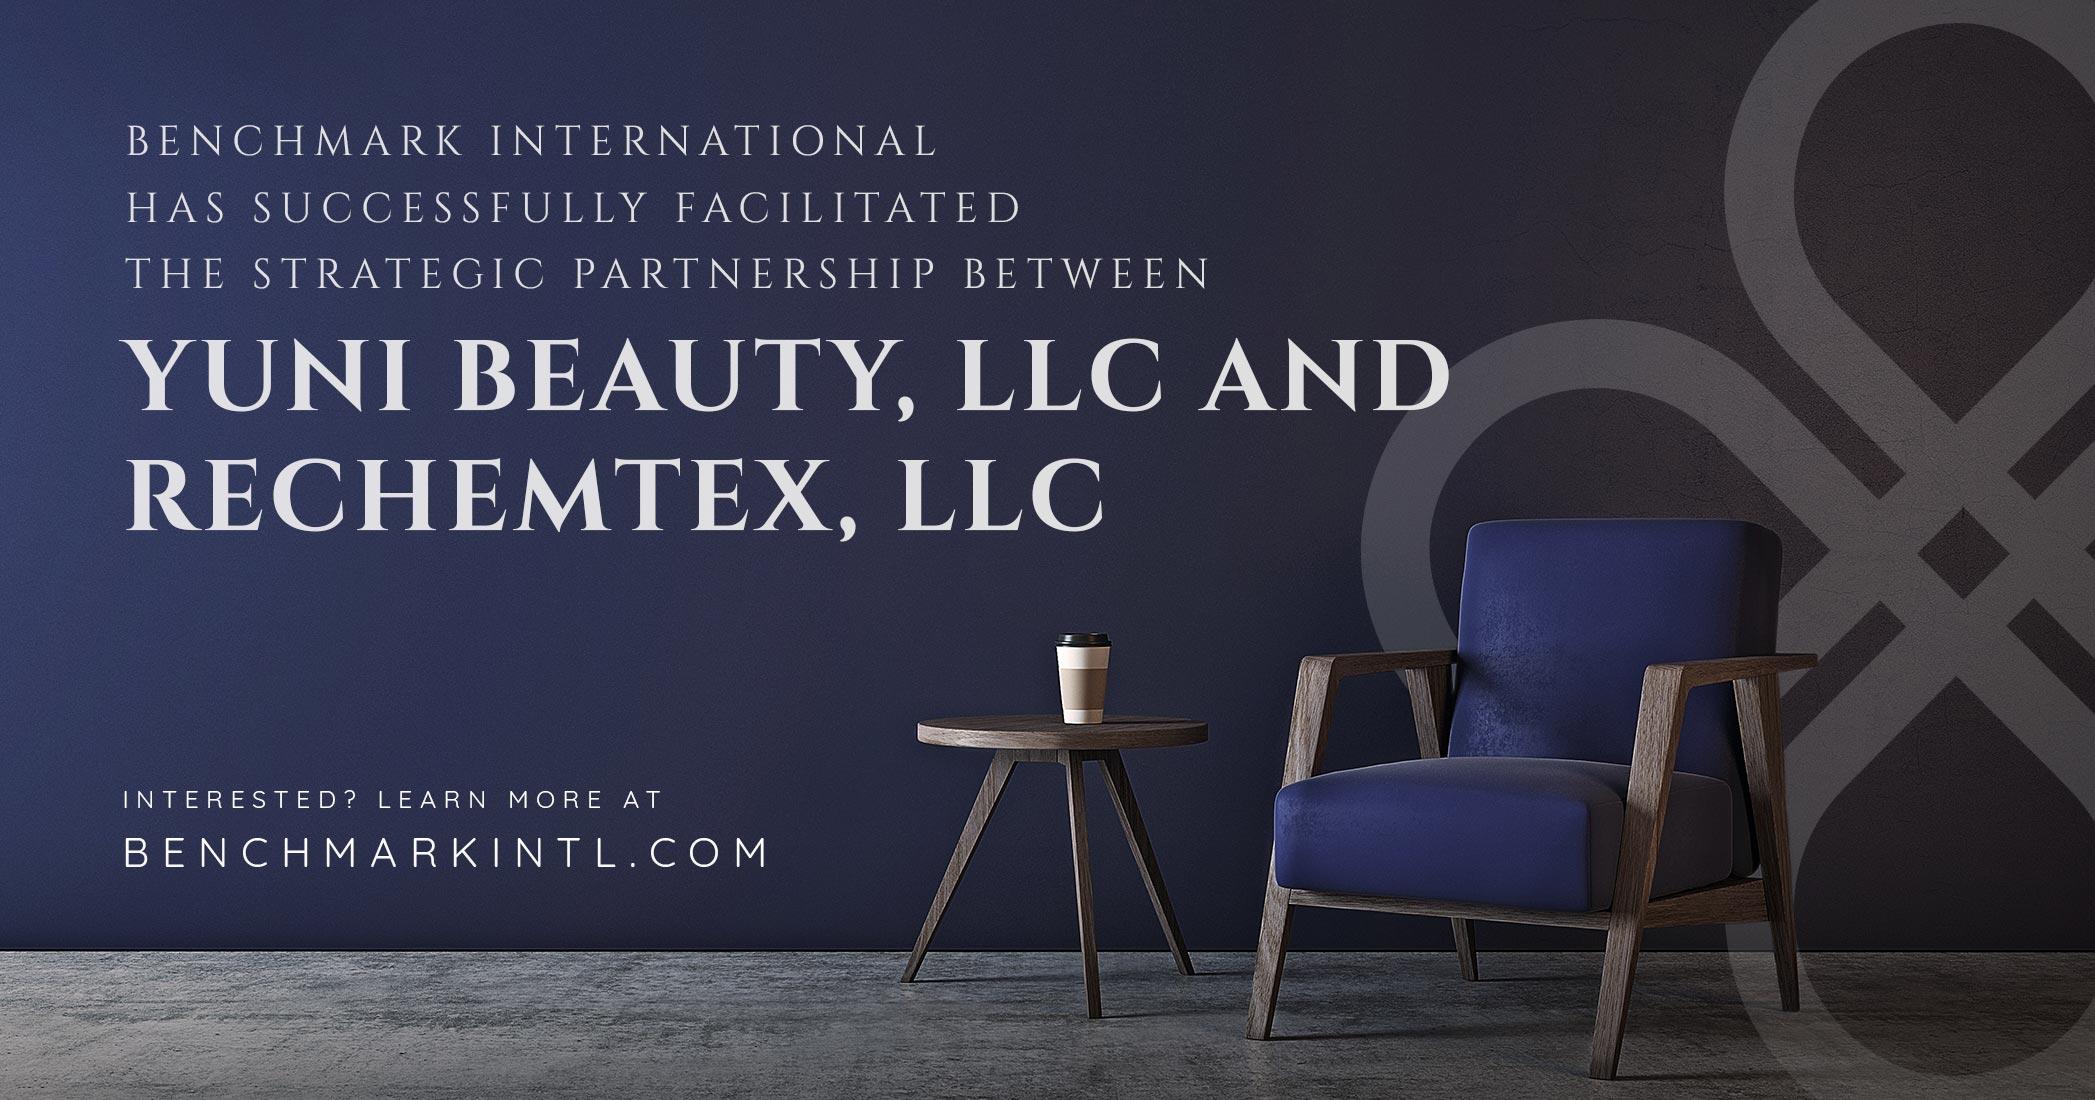 Benchmark International Successfully Facilitated the Strategic Partnership Between Yuni Beauty, LLC and Rechemtex, LLC